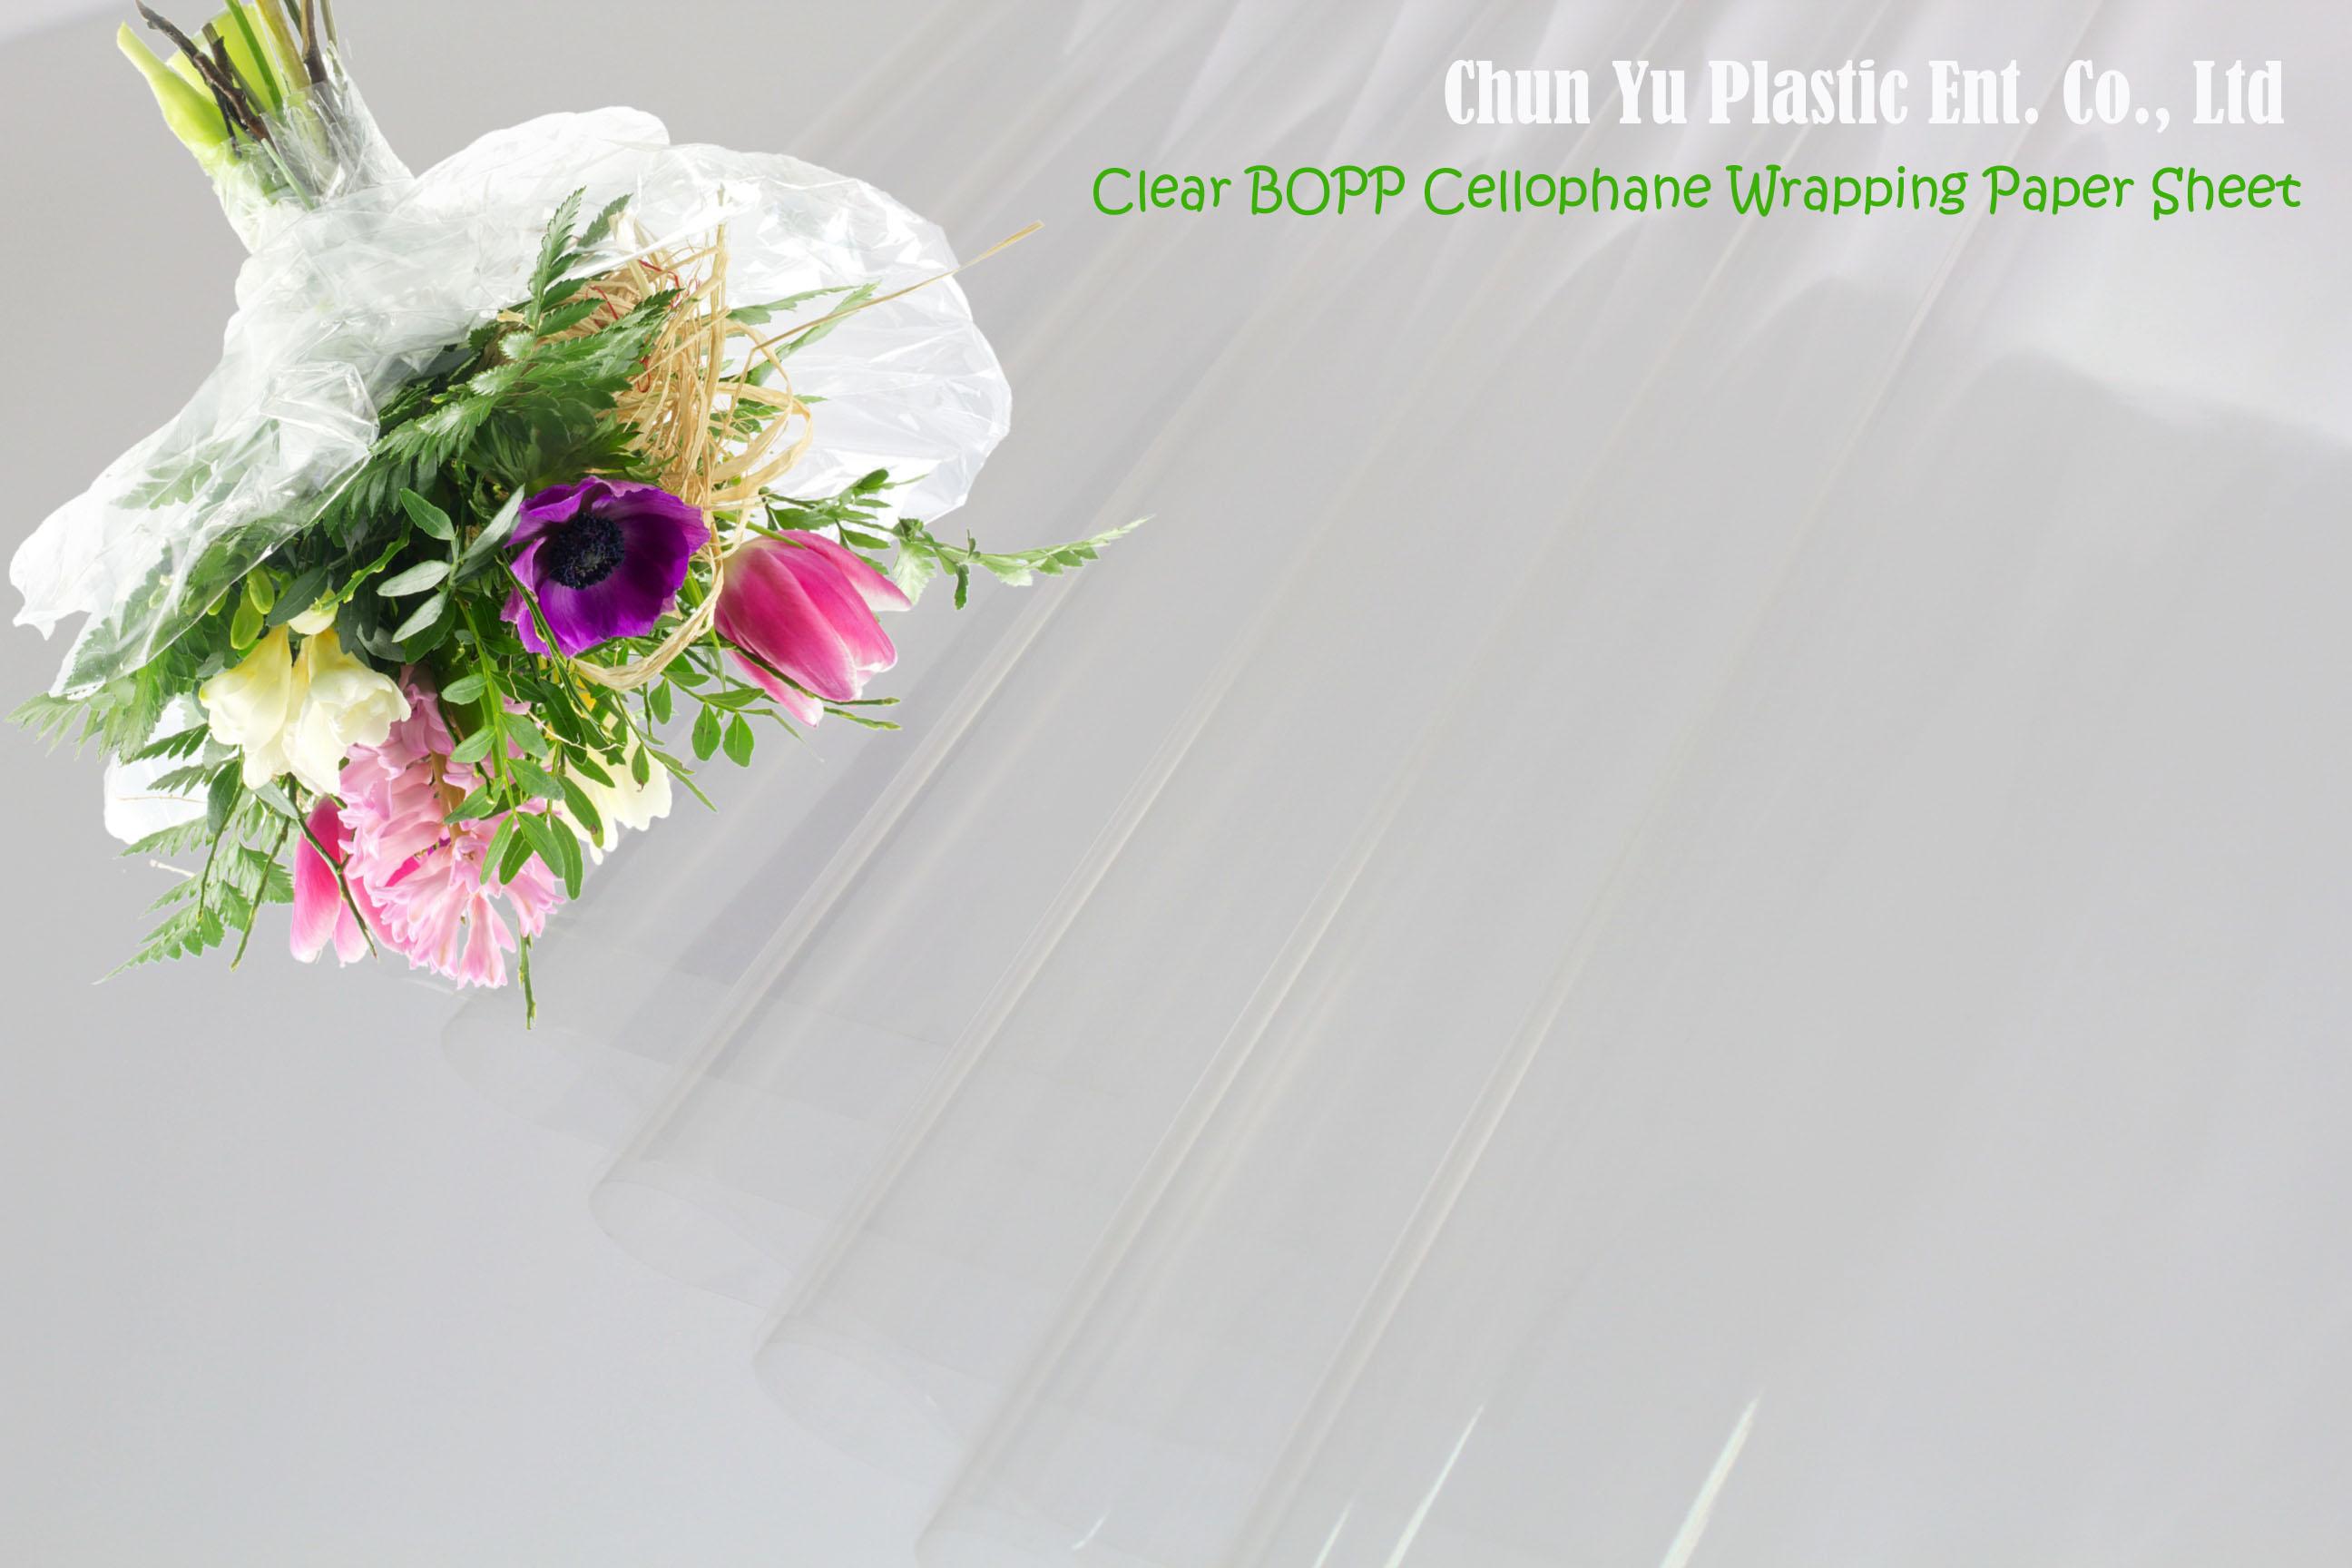 Clear Bopp Cellophane Wrapping Paper Sheet Manufacturing Chun Yu